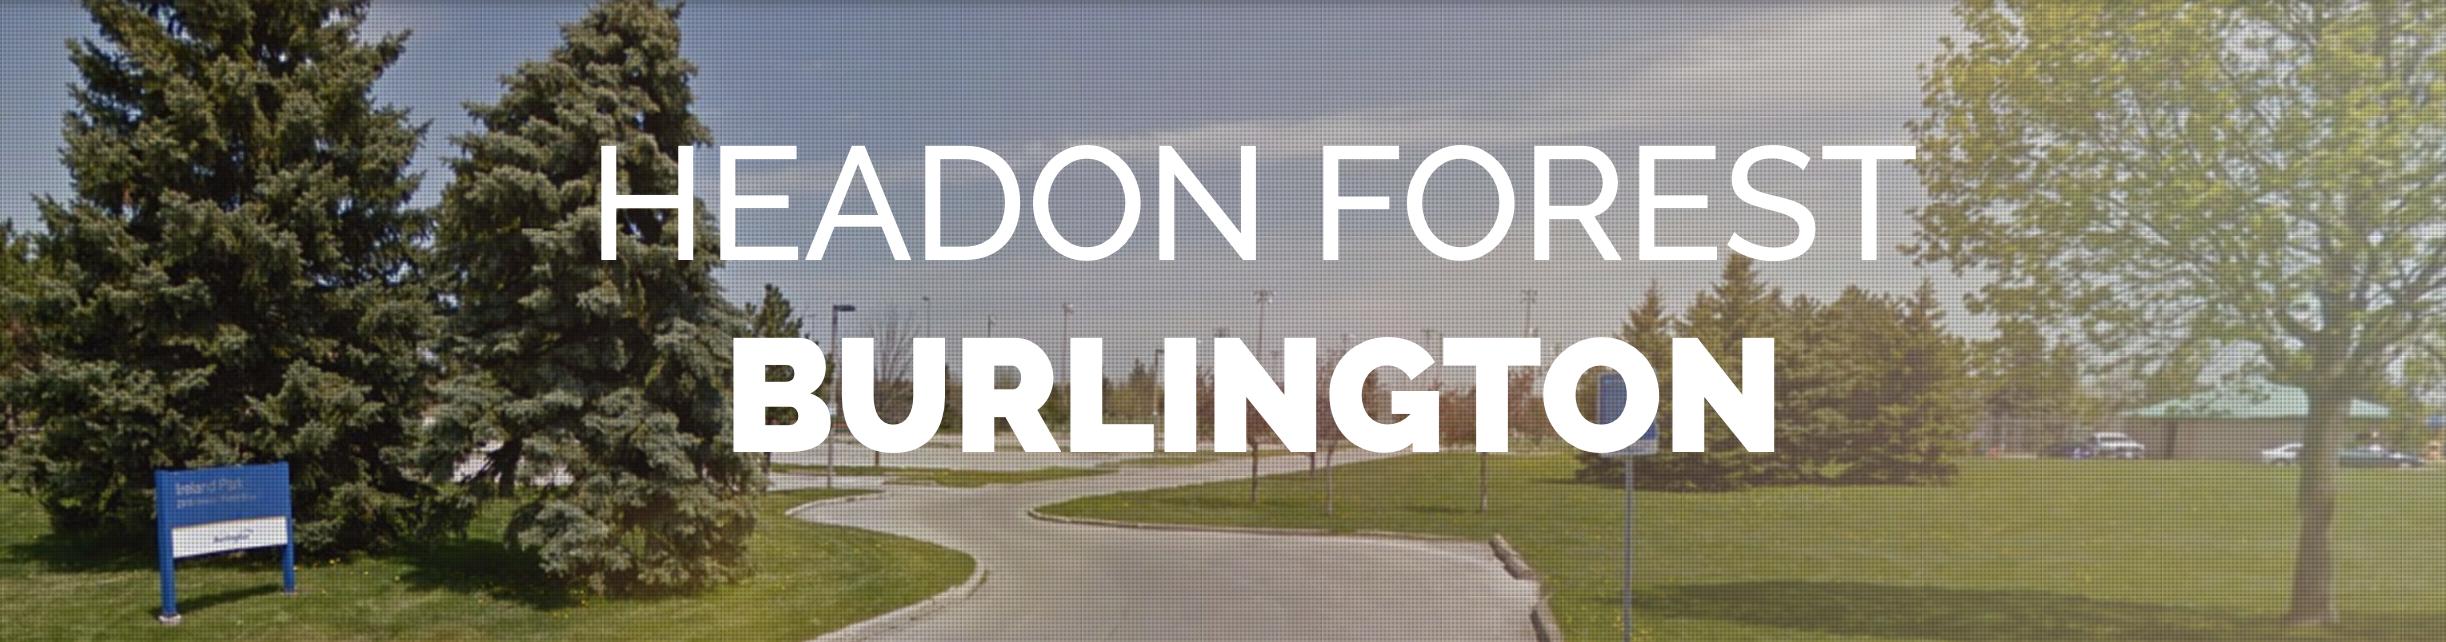 Headon Forest Burlington